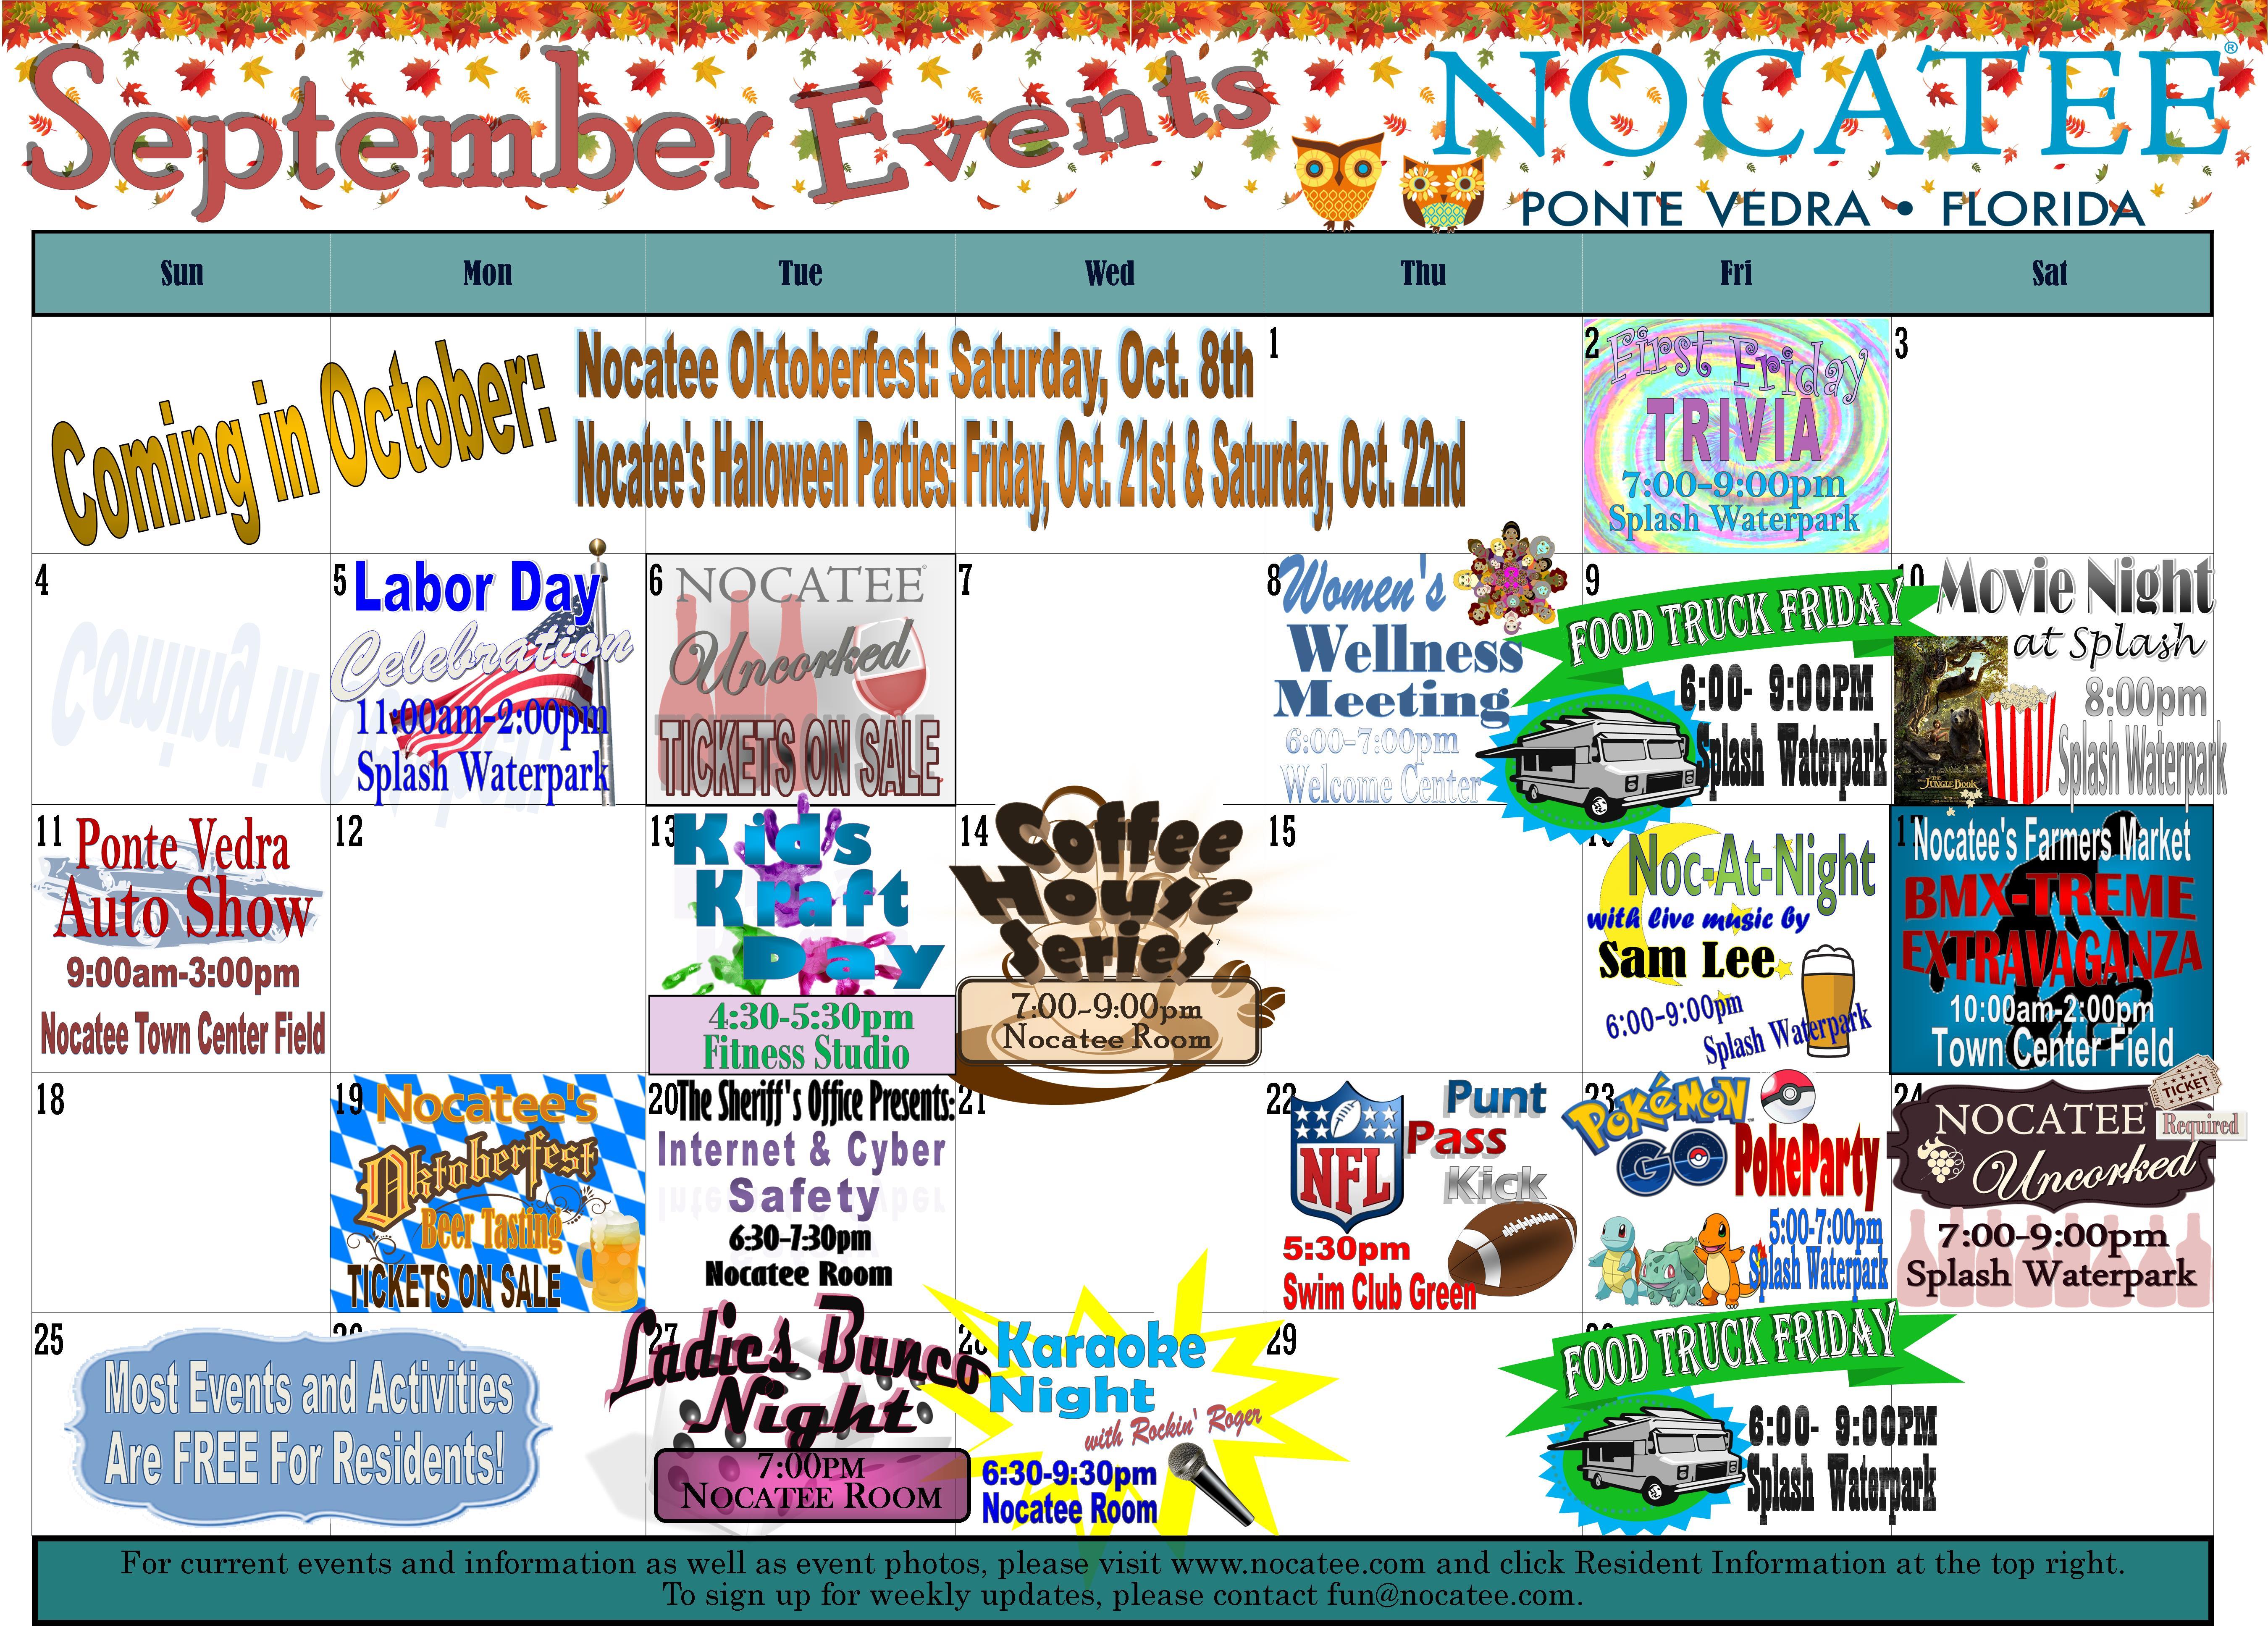 September_16_Activities.jpg